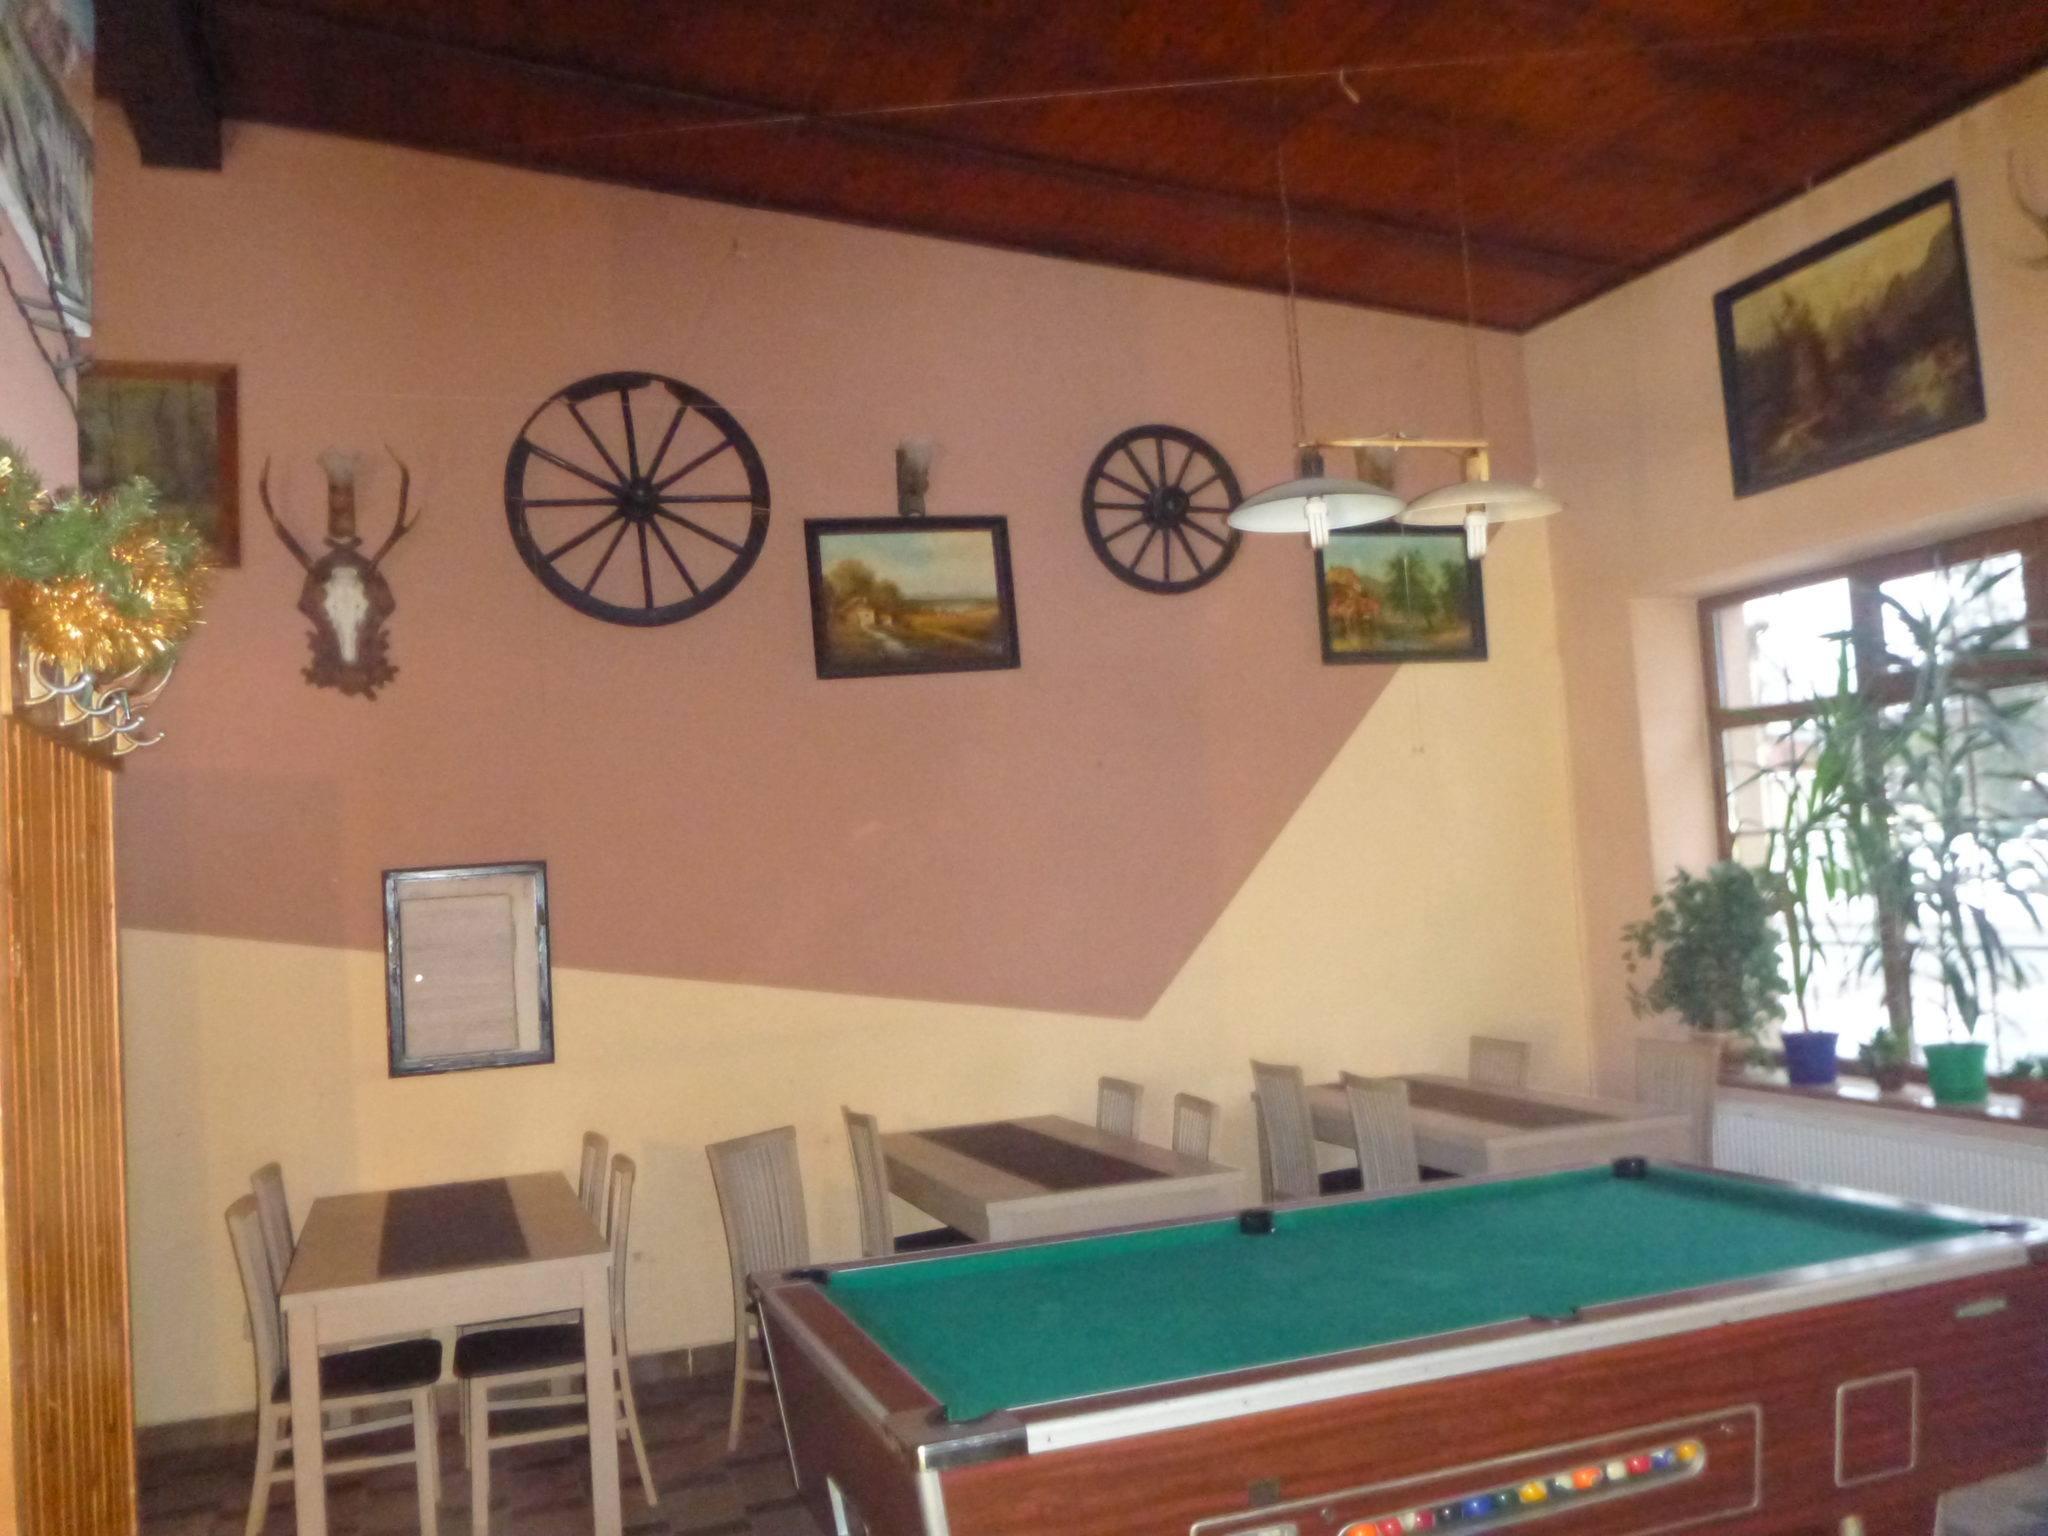 Piątkowe Picie The Best Bars In Biskupiec Northern Irishman In - Old school pool table